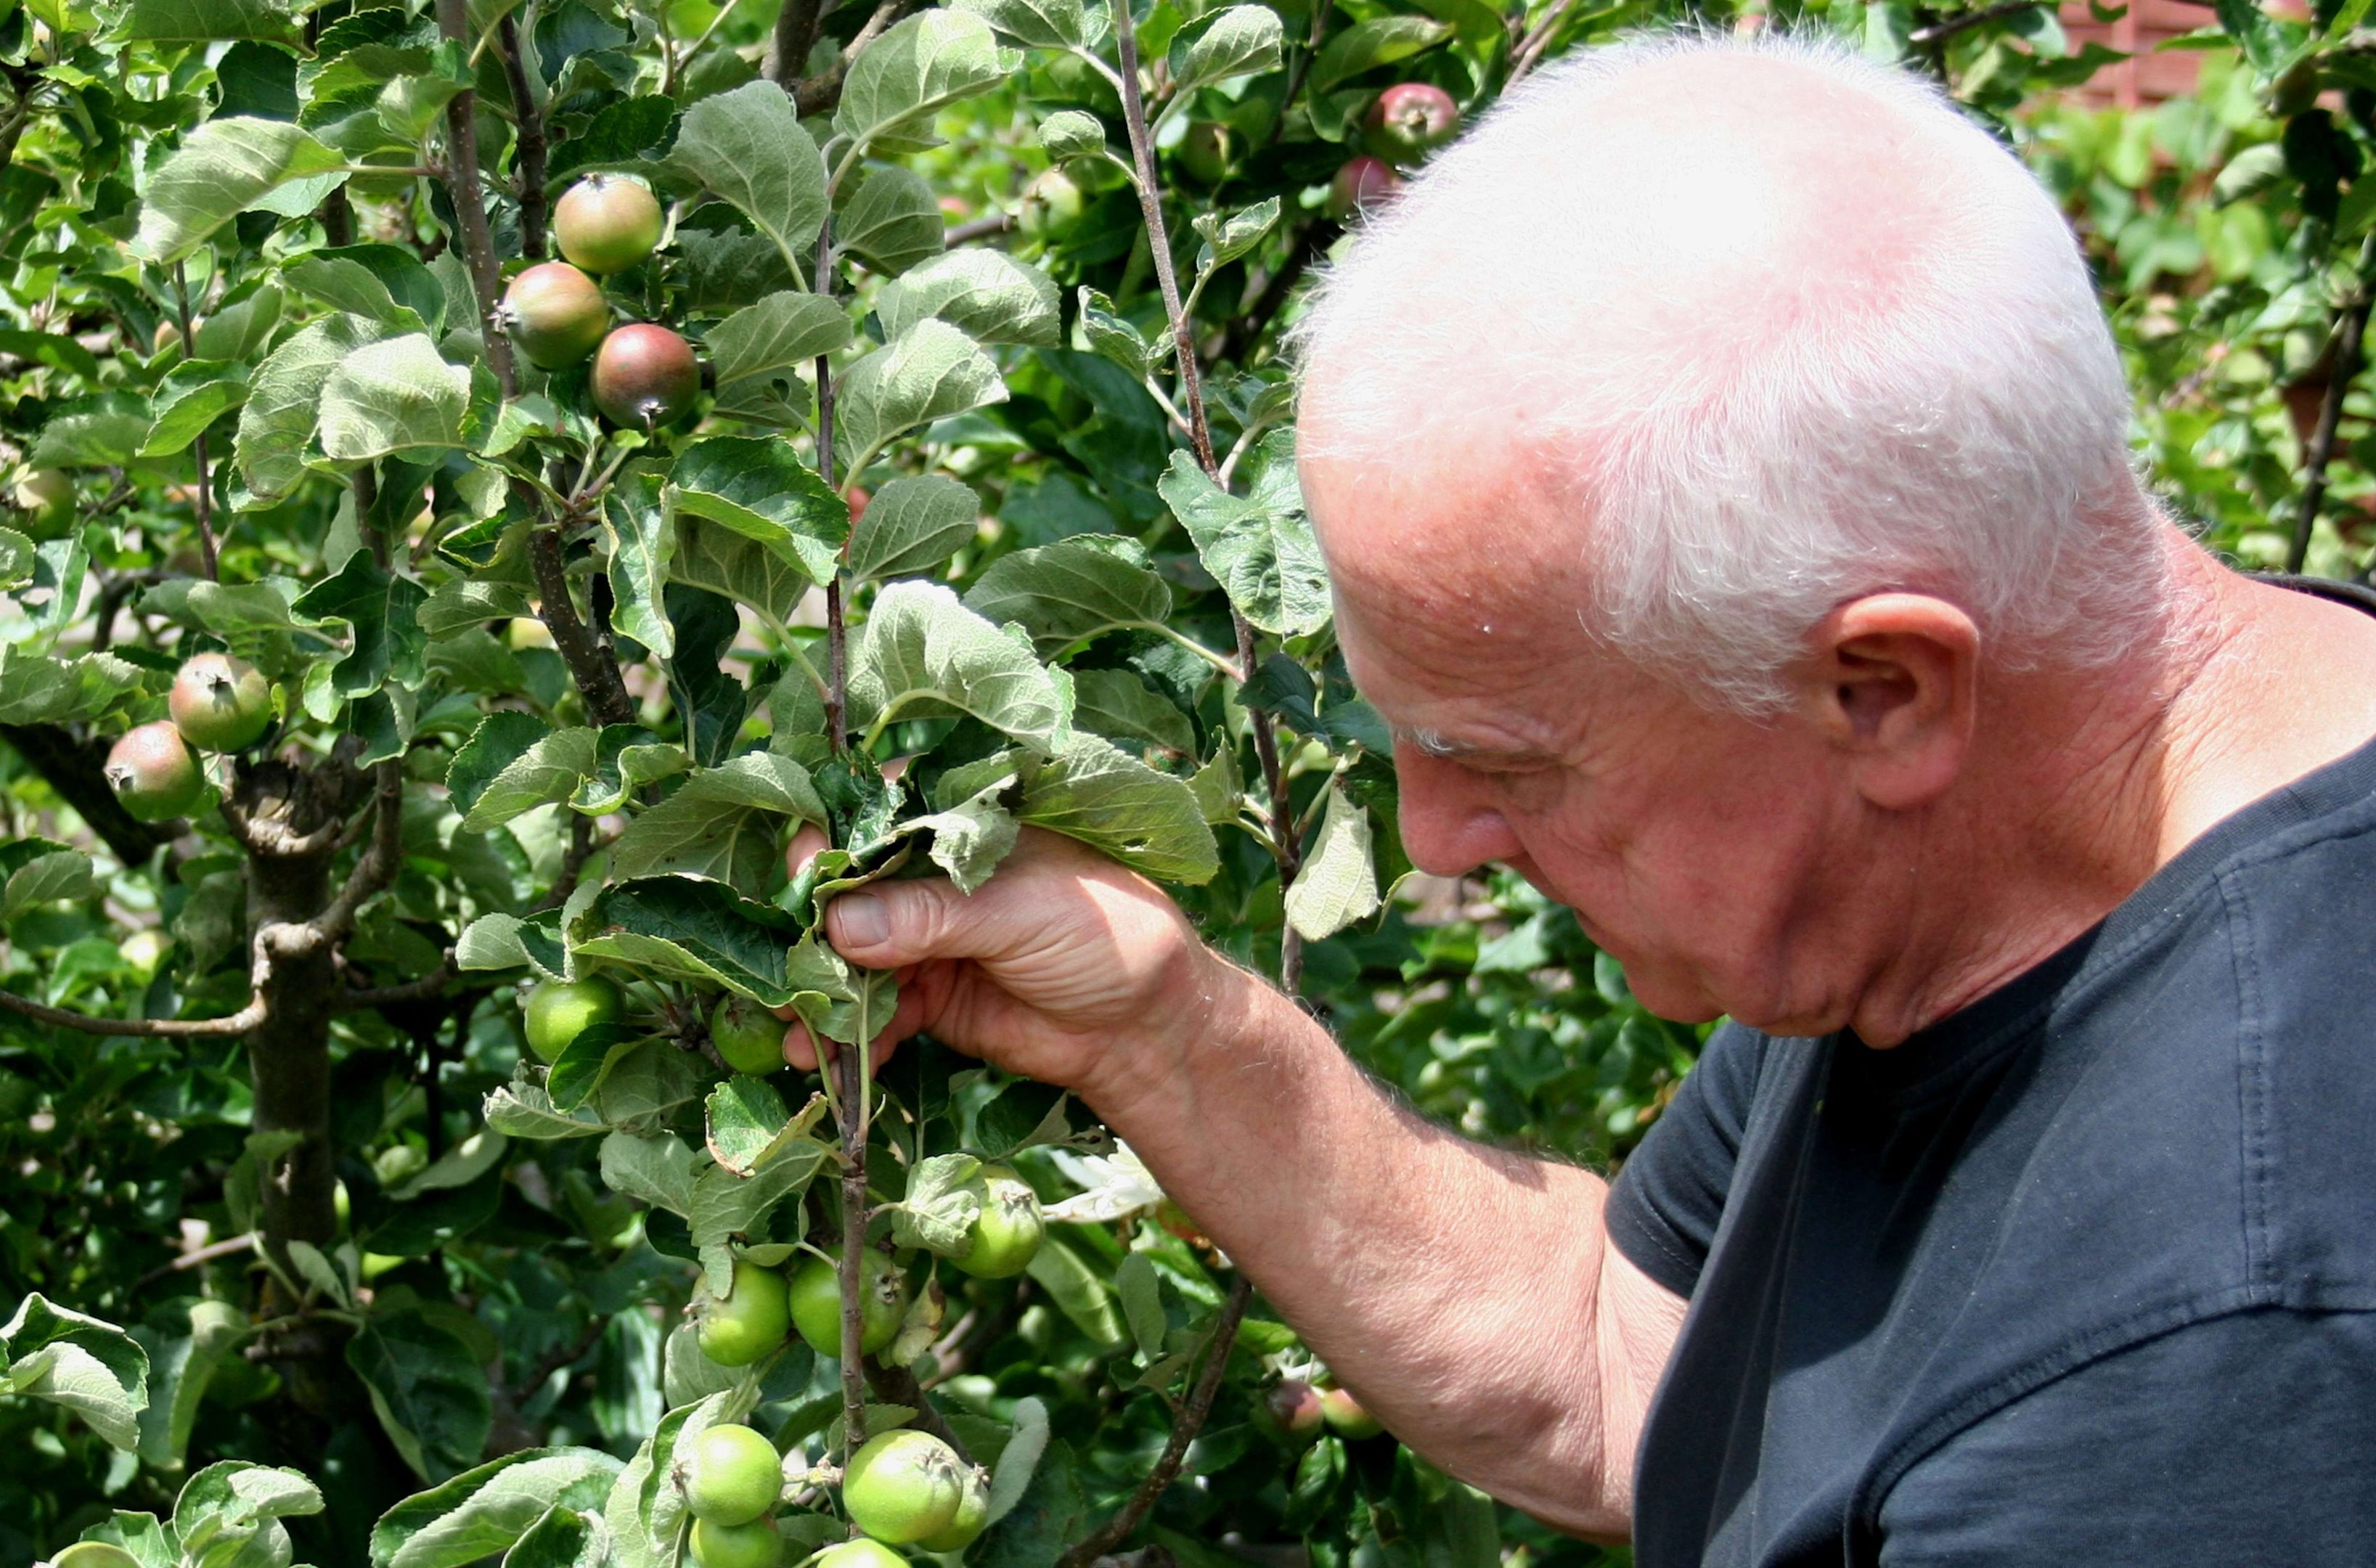 Thinning apples